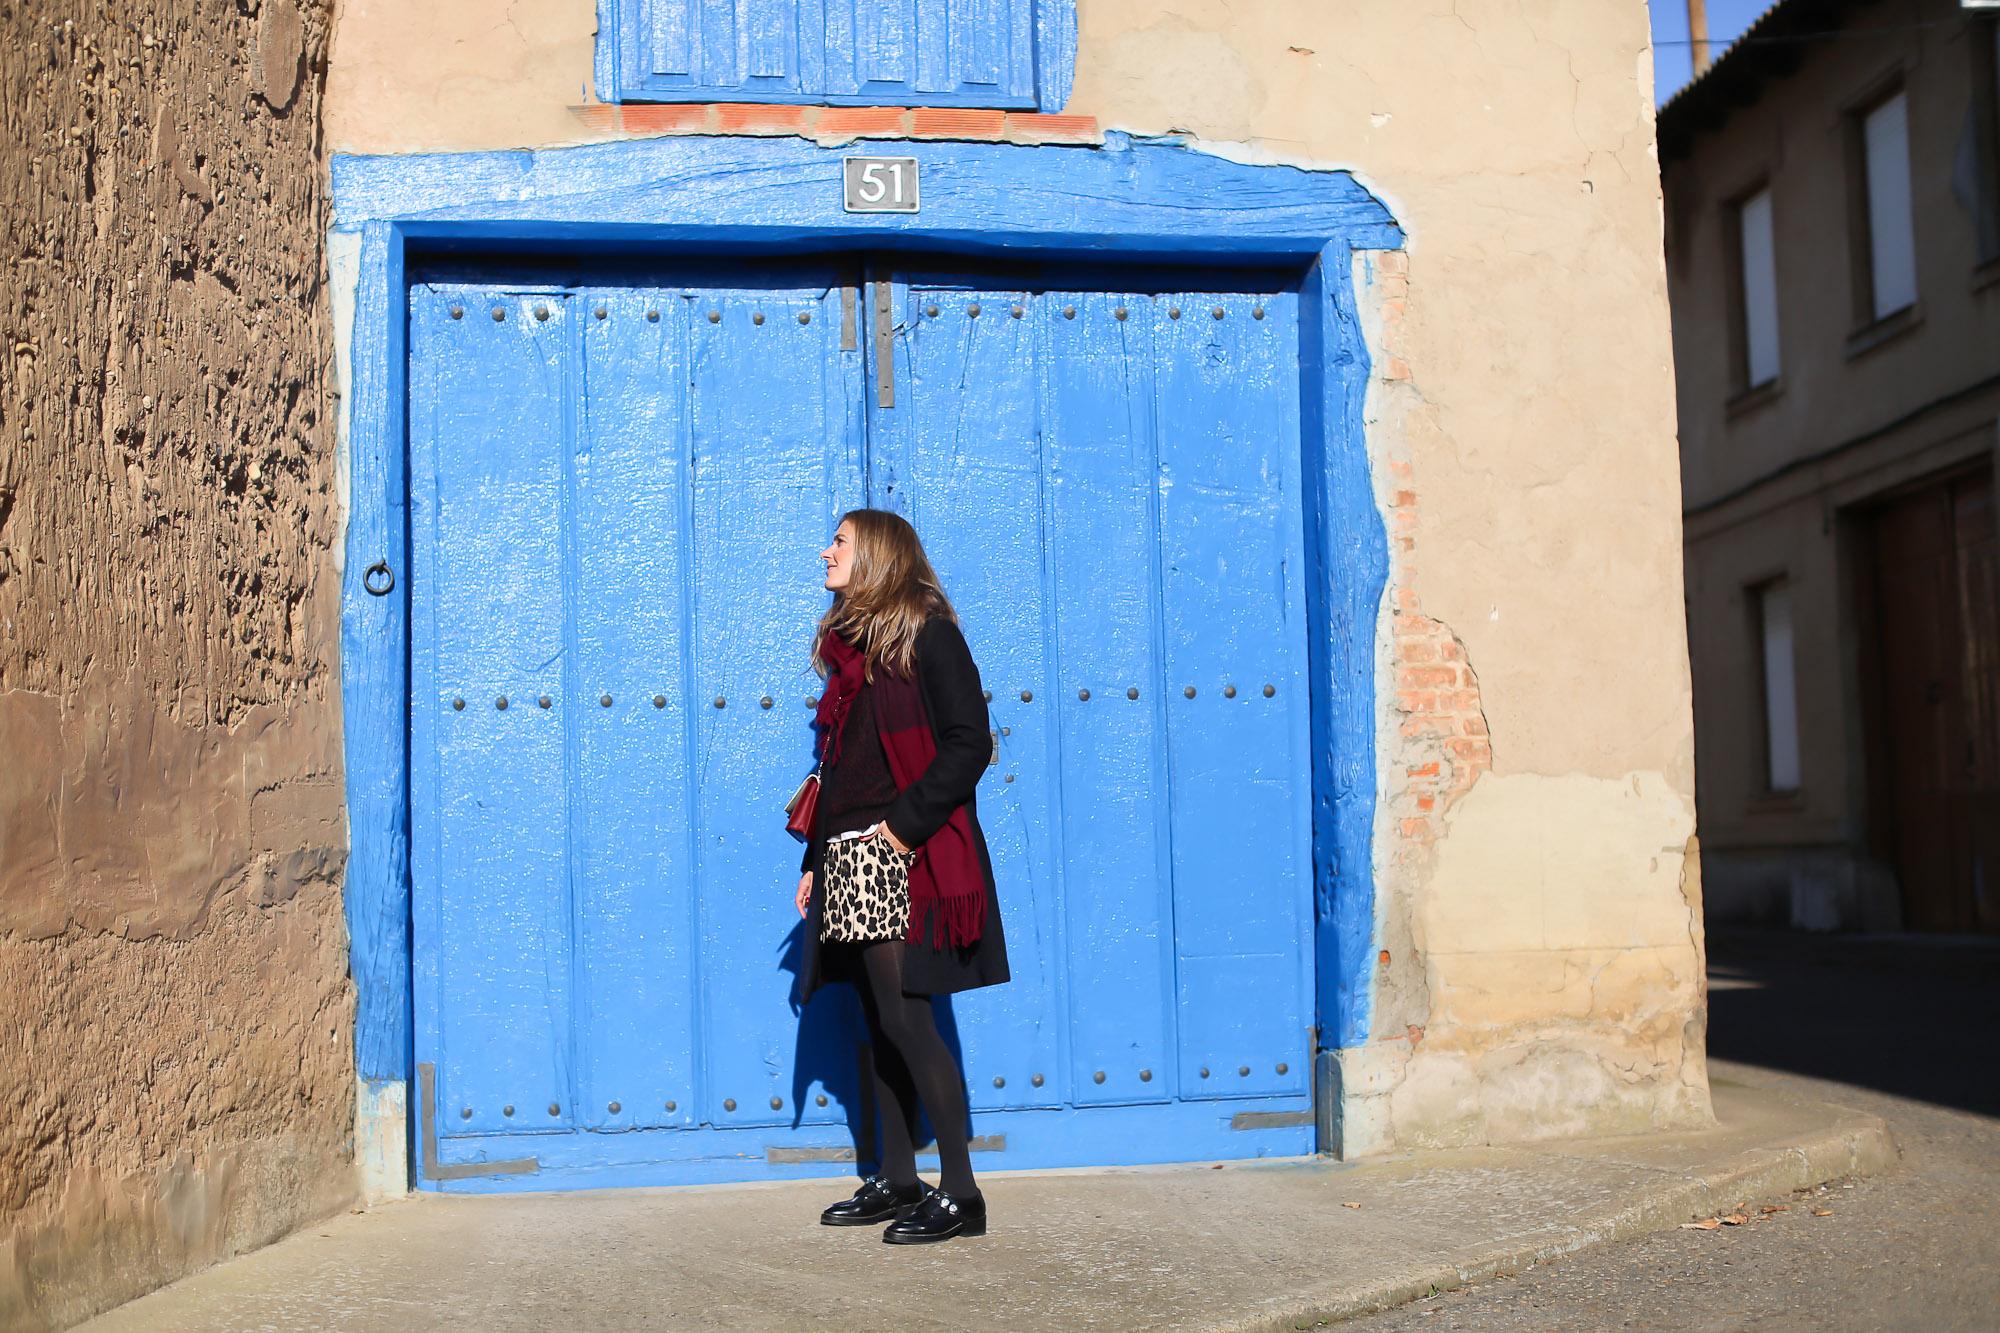 Clochet_streetstyle_fashionblogger_IKKSwoolknit_titamadridspigagranate_sandrobrogues_zaraleopardshorts-2